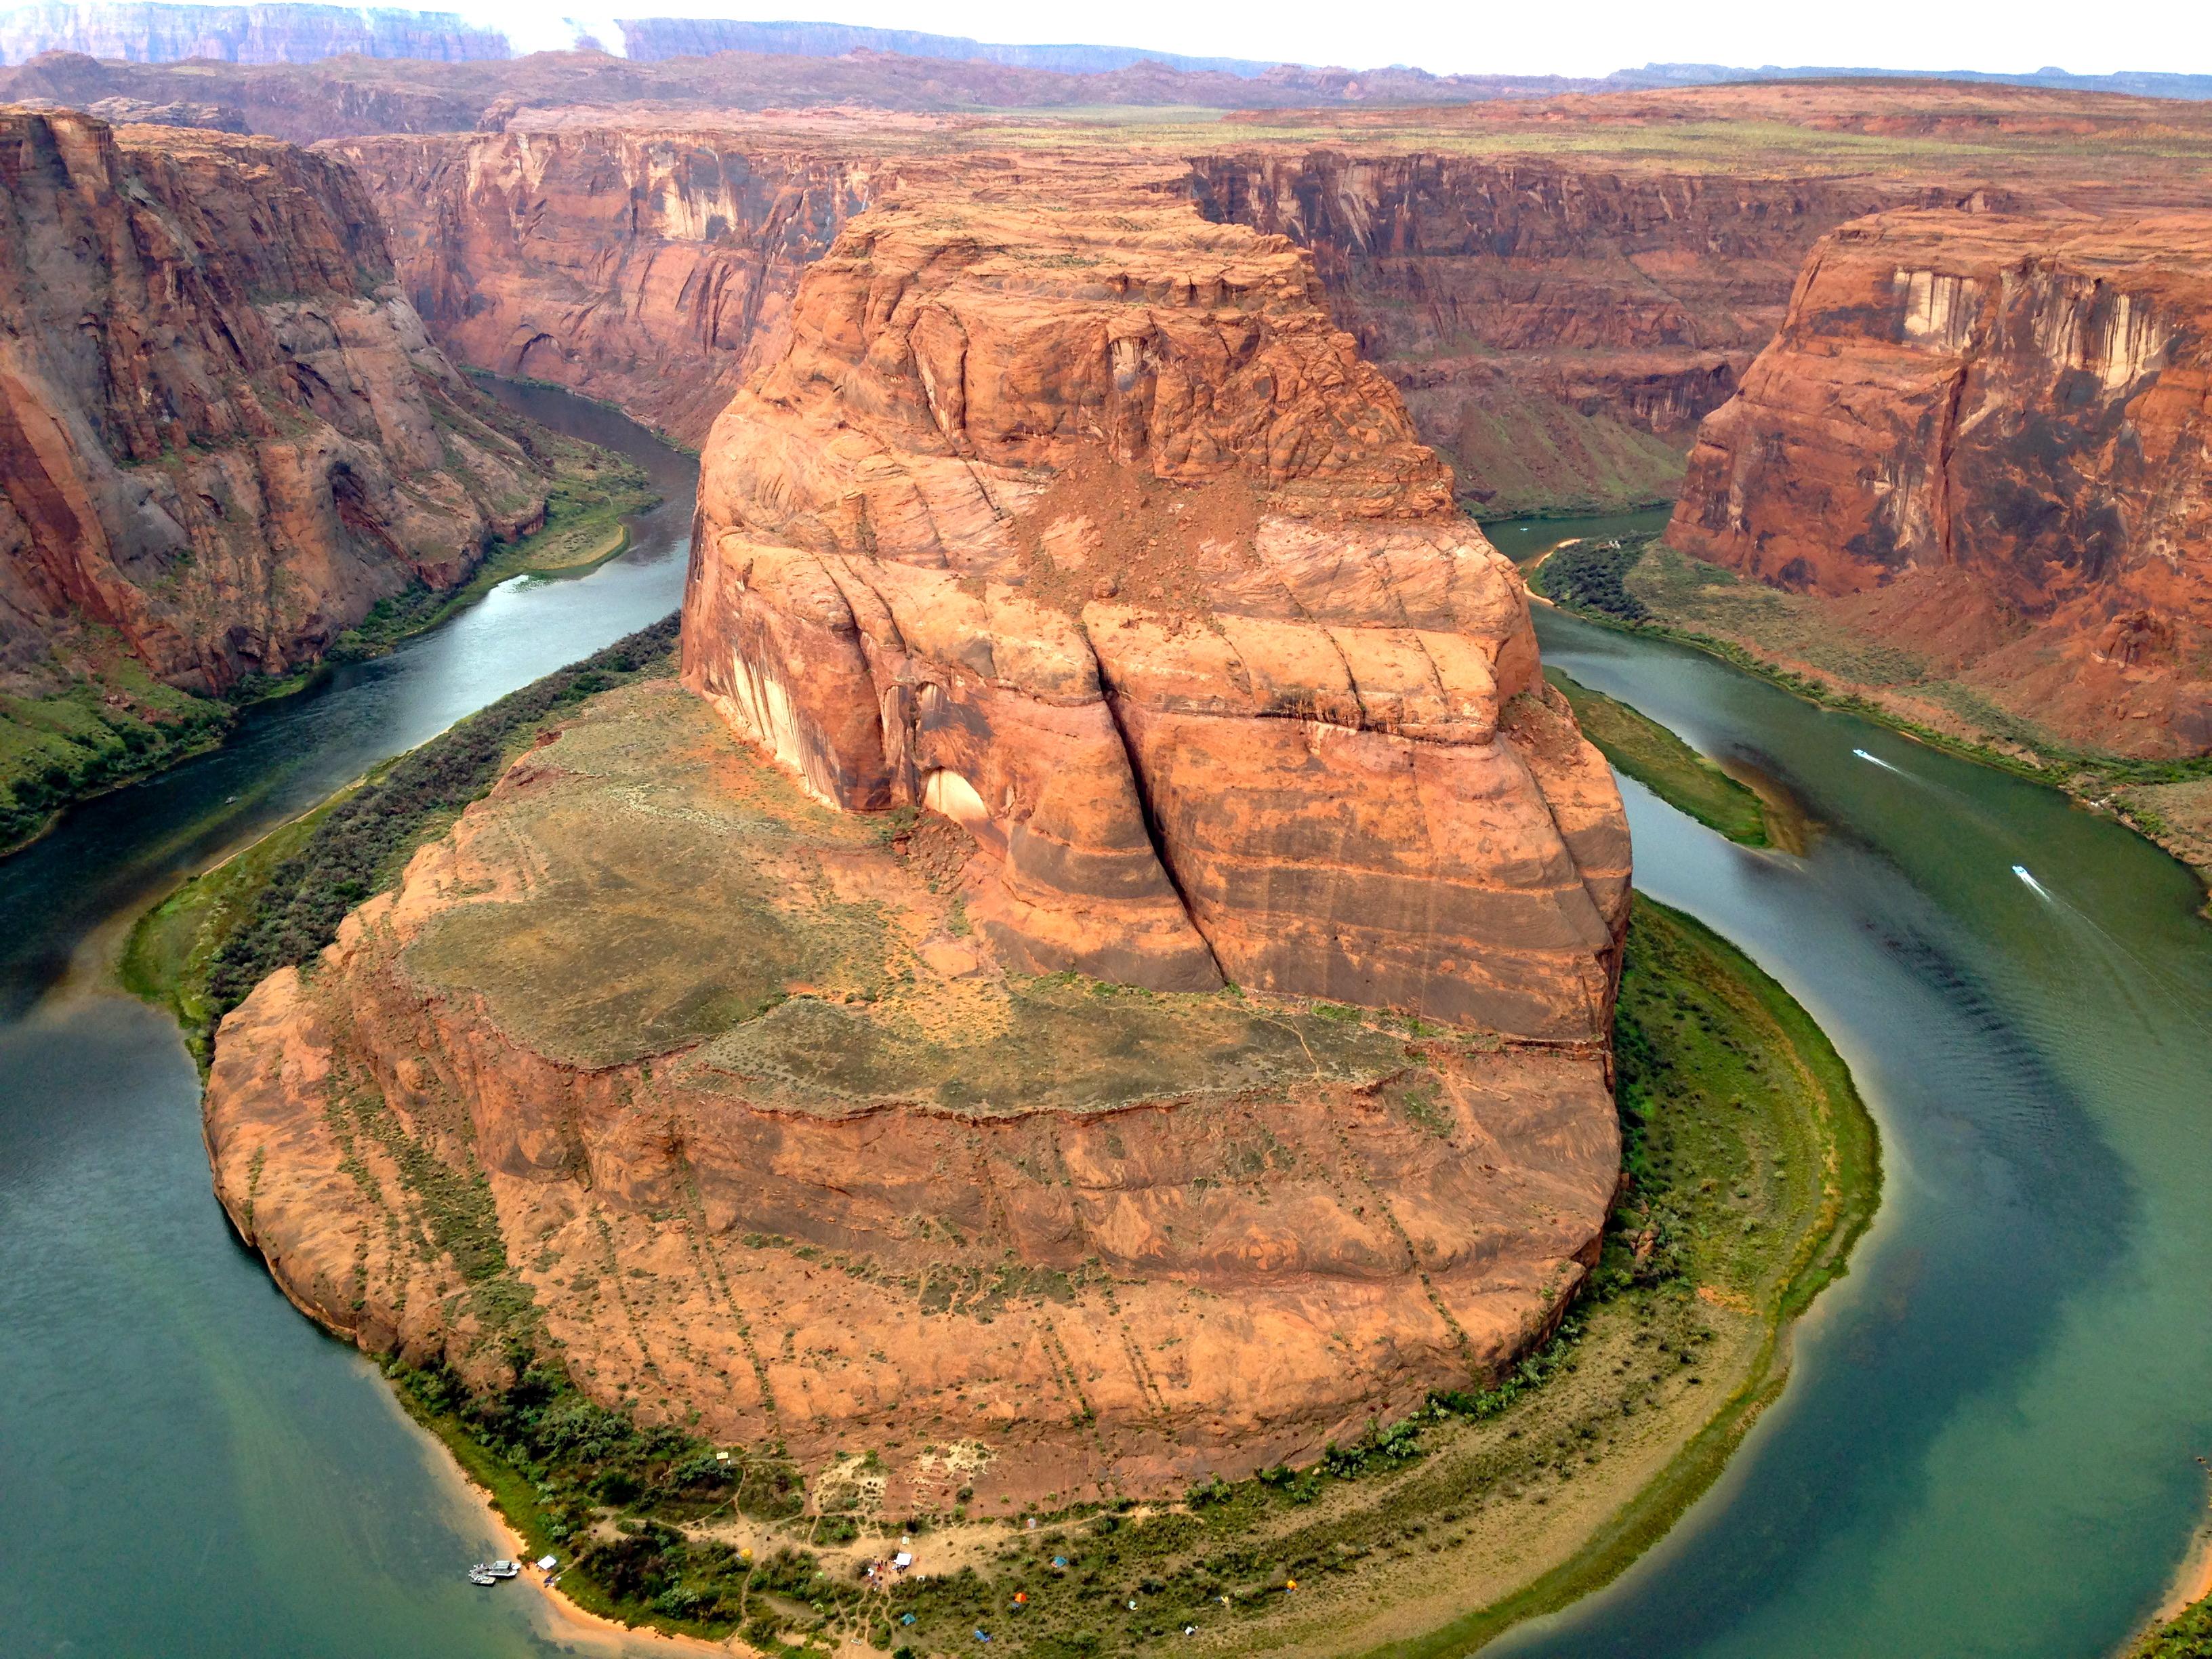 Horseshoe Bend: A Hidden Gem in the American Southwest